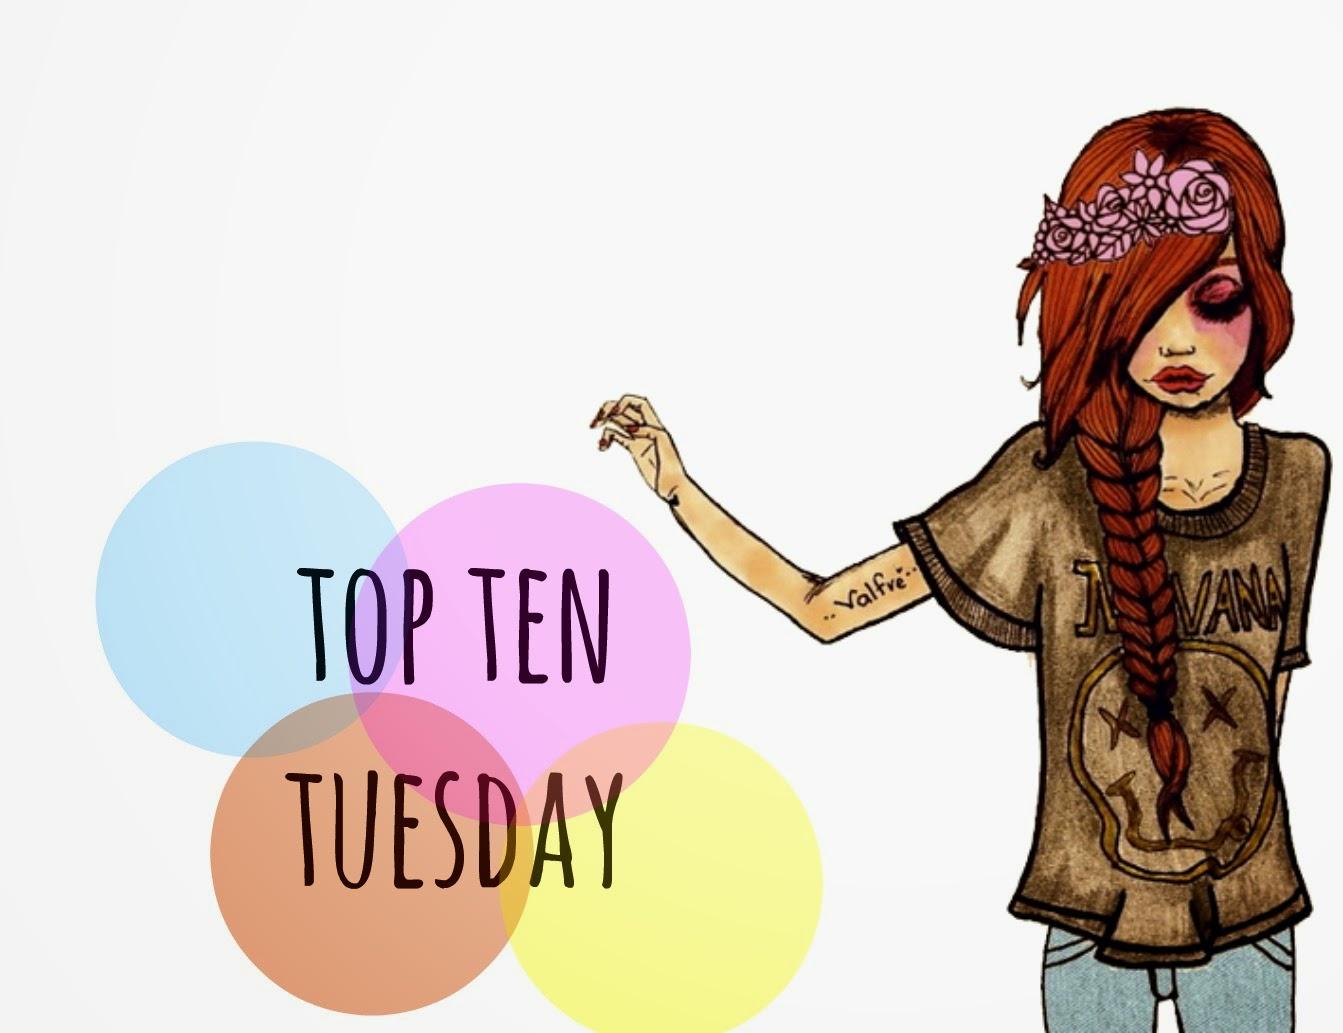 Top ten tuesday #1.Libros que siempre recomiendo.